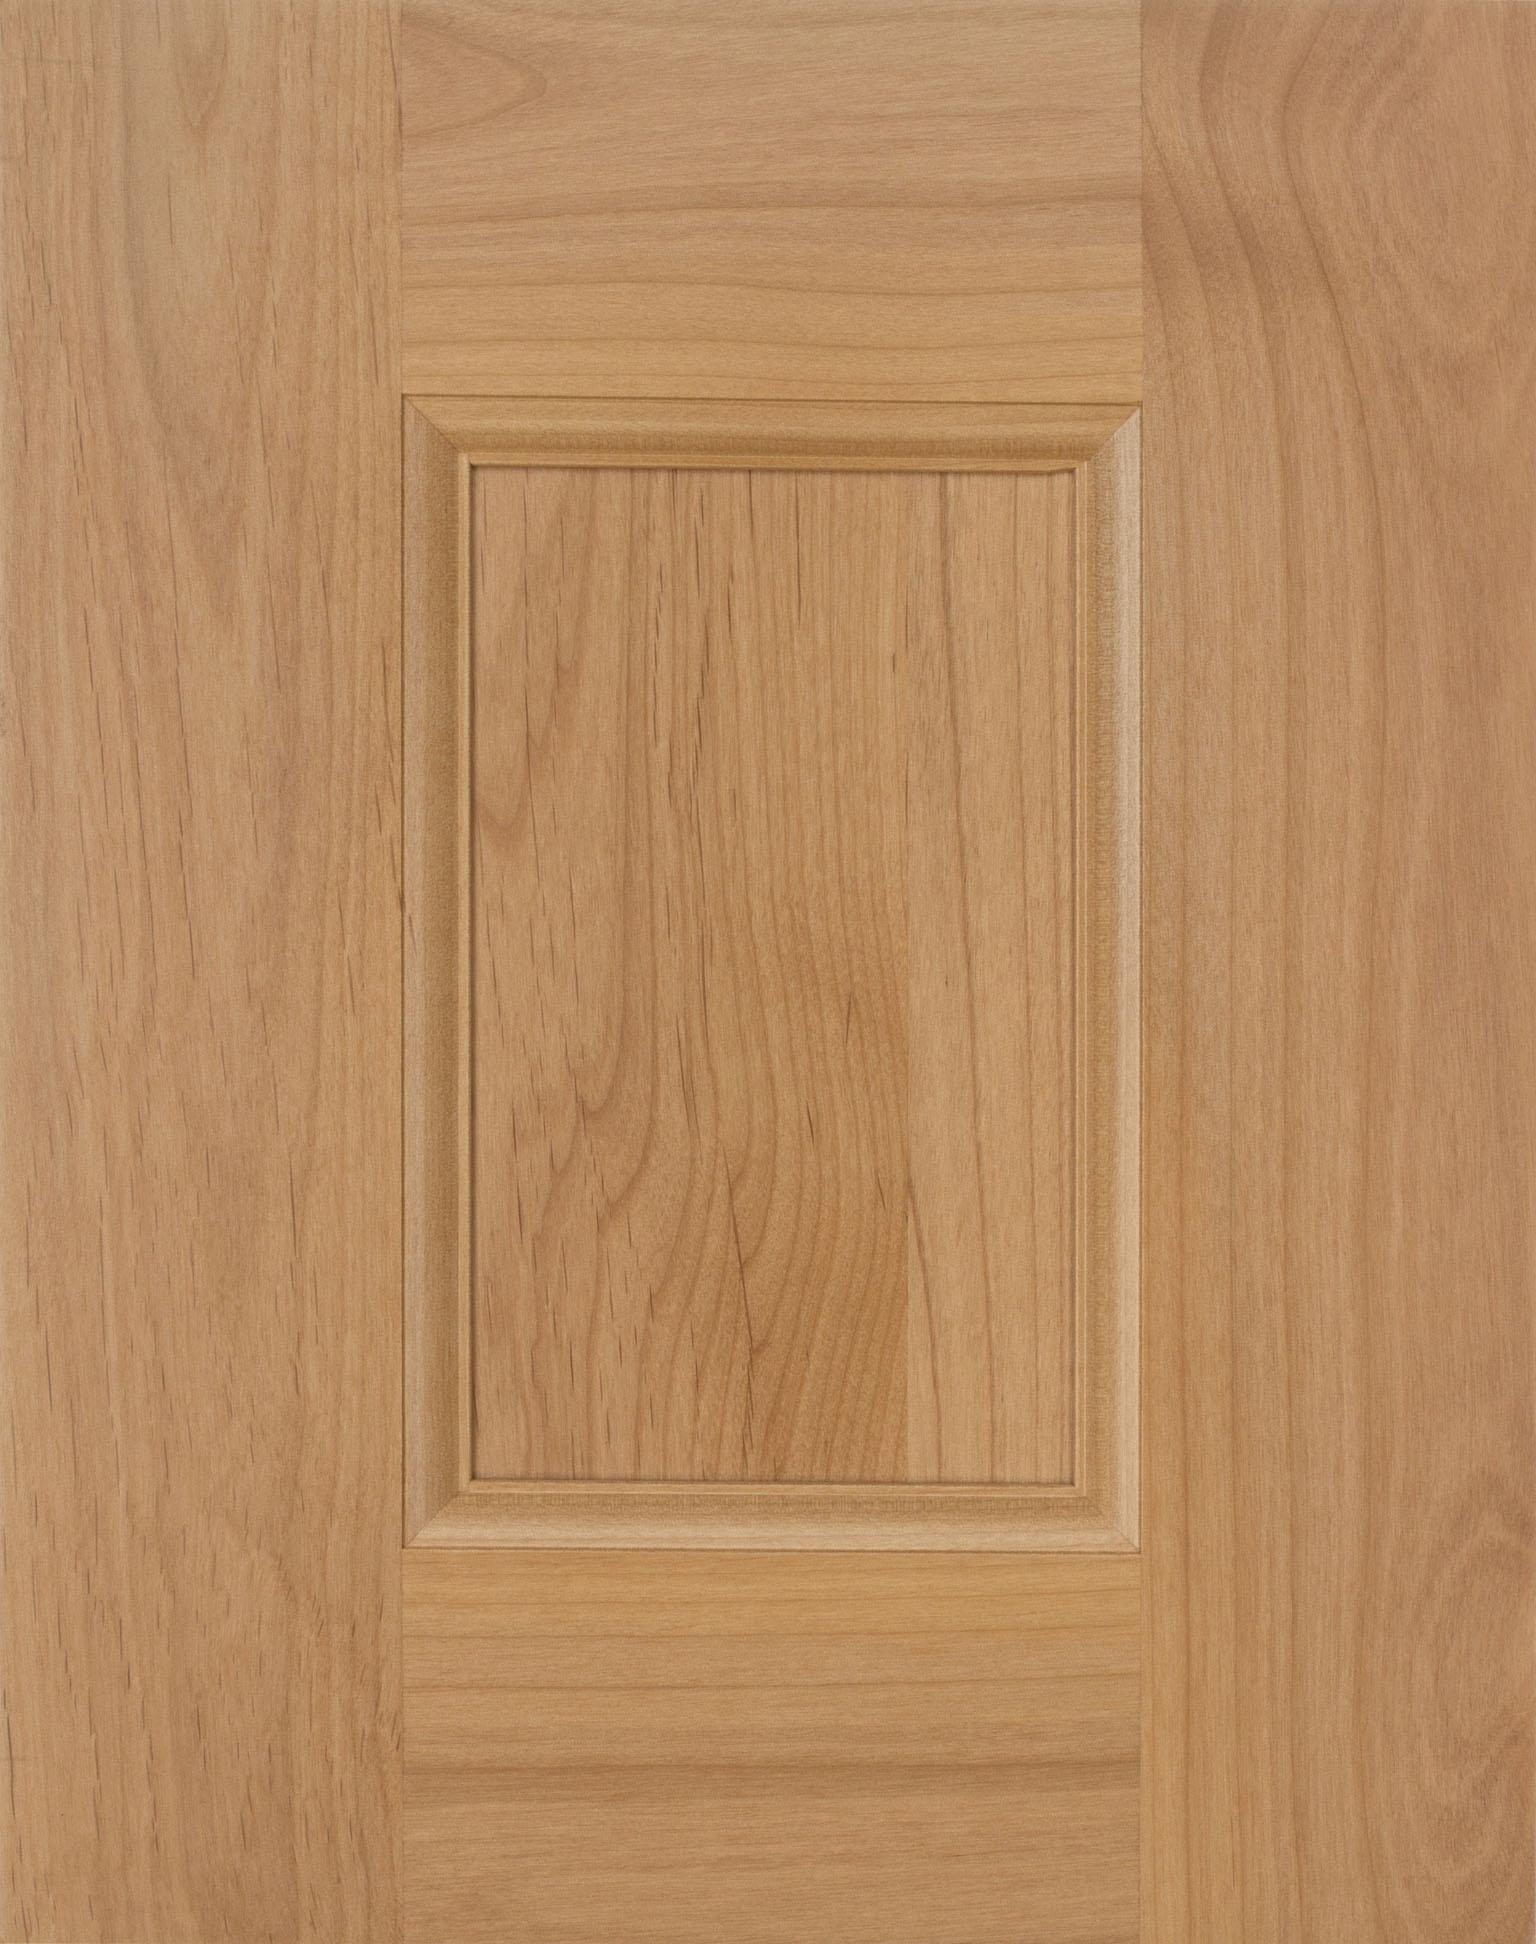 Windsor Flat Panel